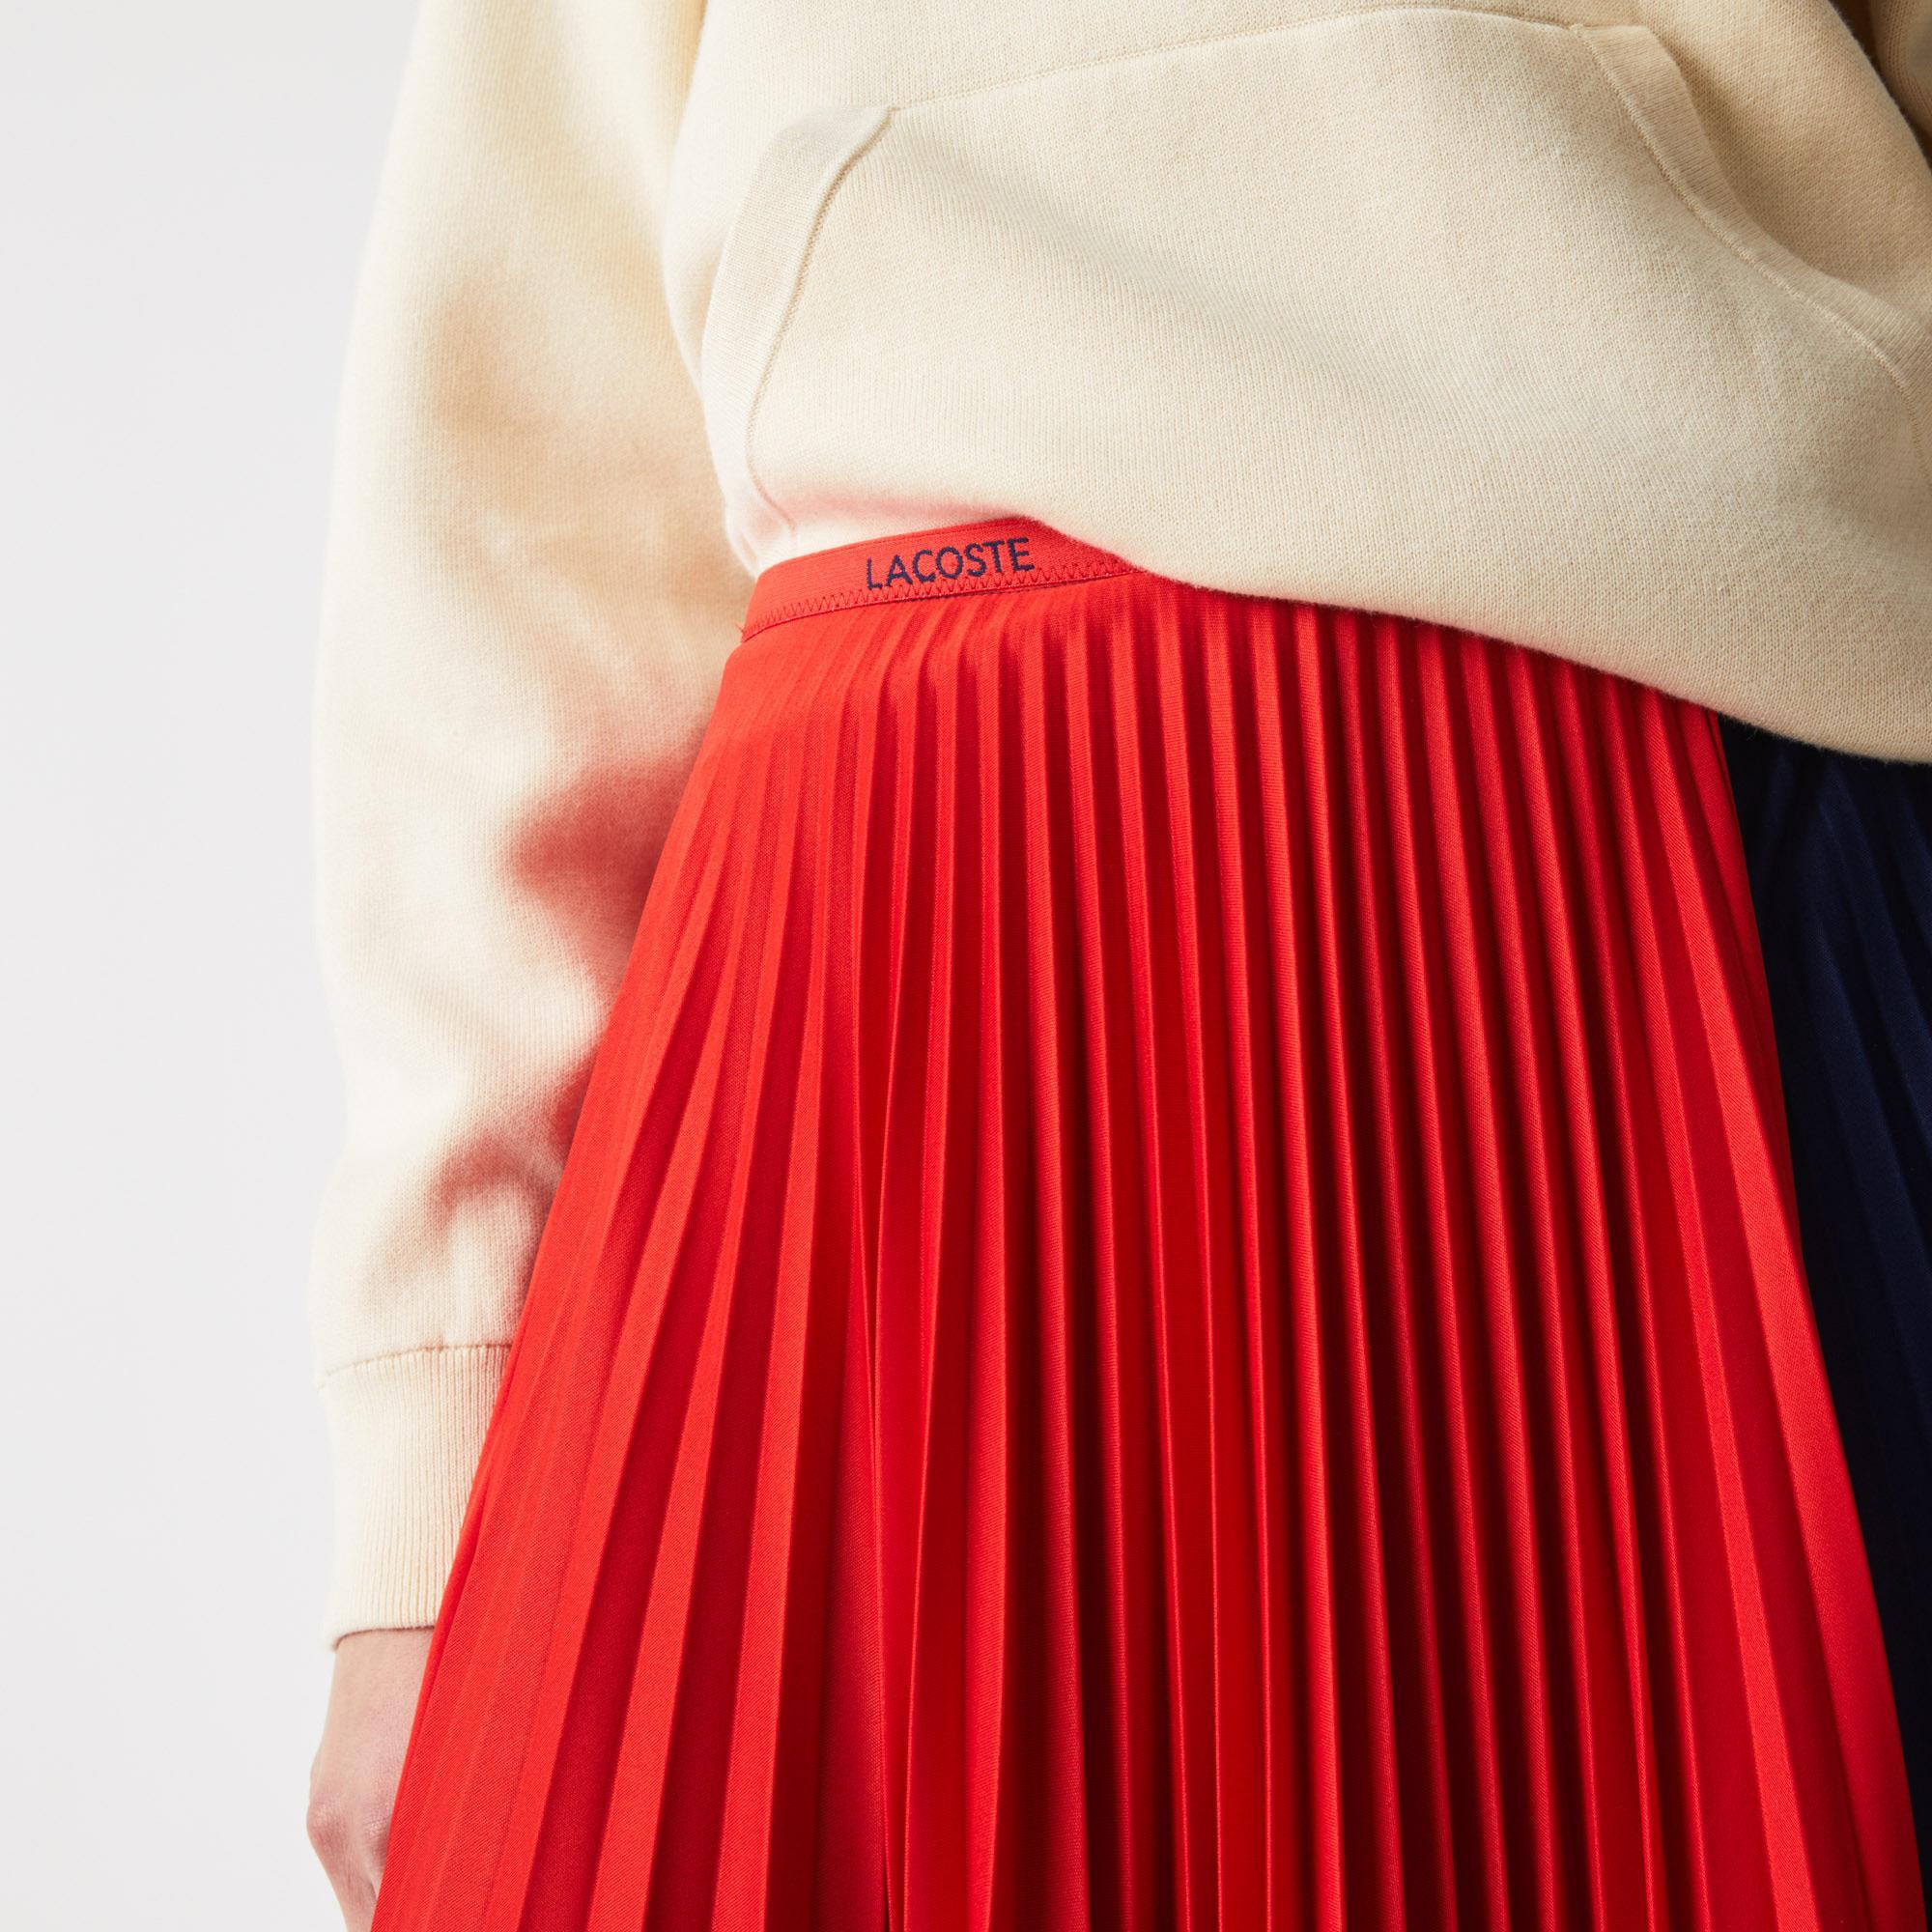 Lacoste Women's Mid-Length Colourblock Pleated Skirt